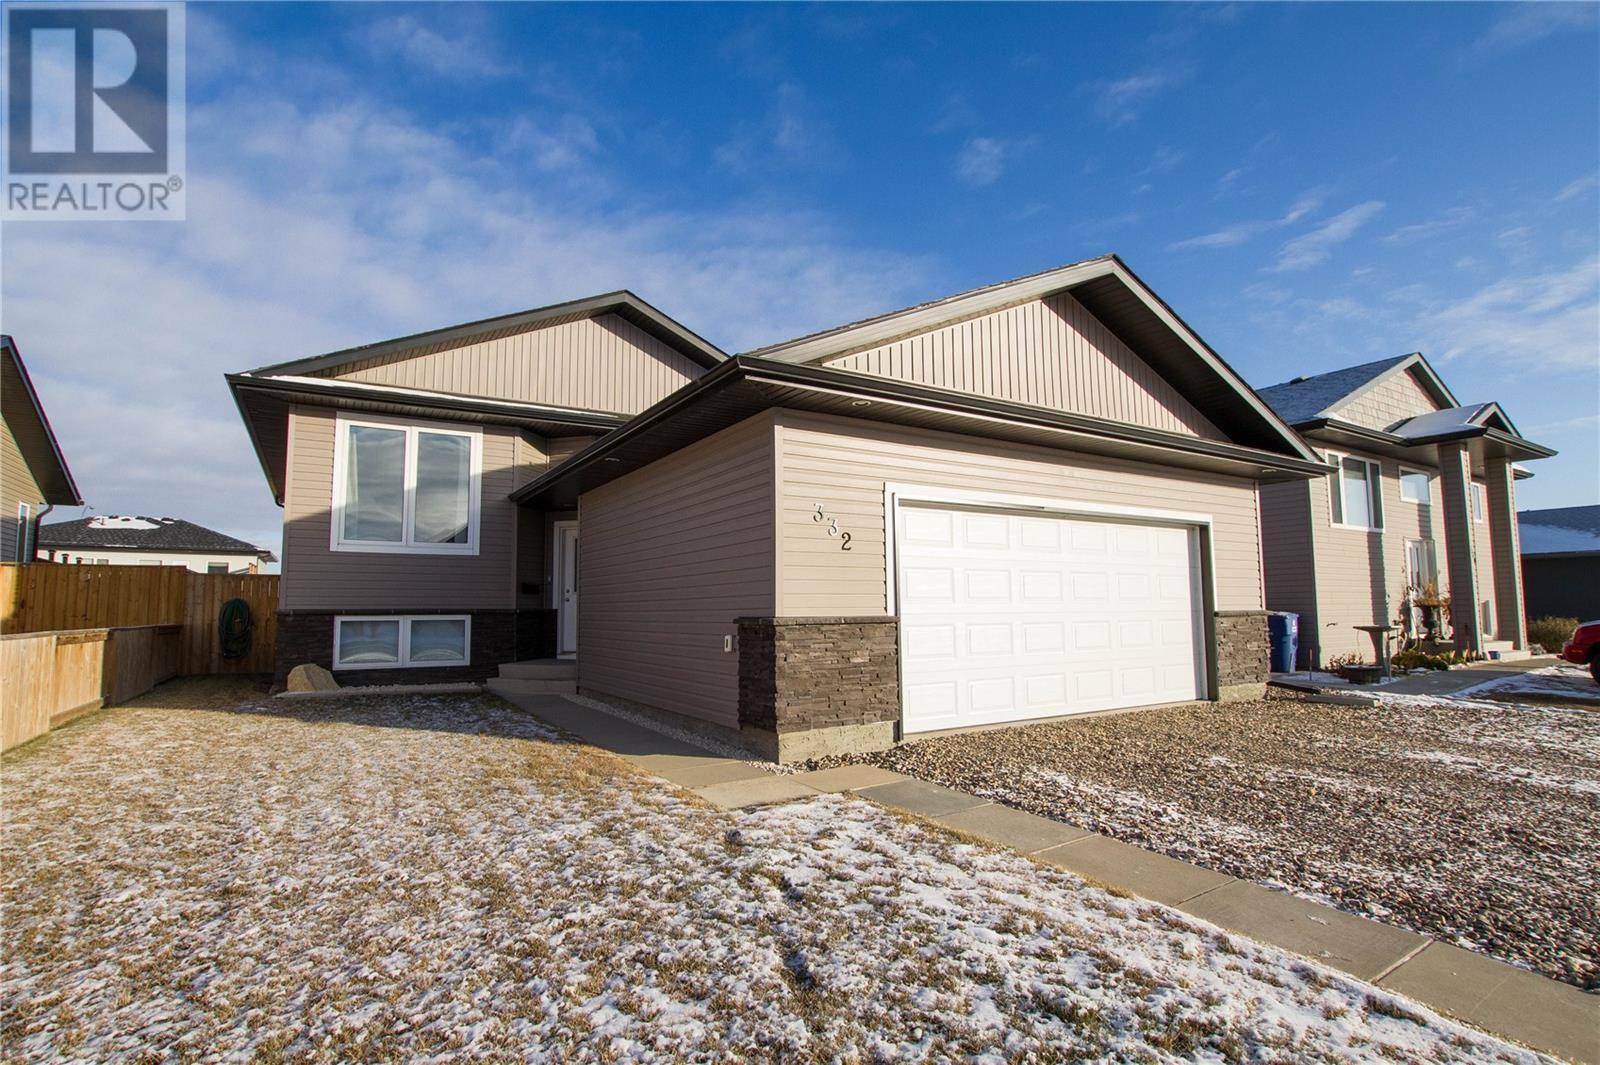 House for sale at 332 Haichert St Warman Saskatchewan - MLS: SK791383